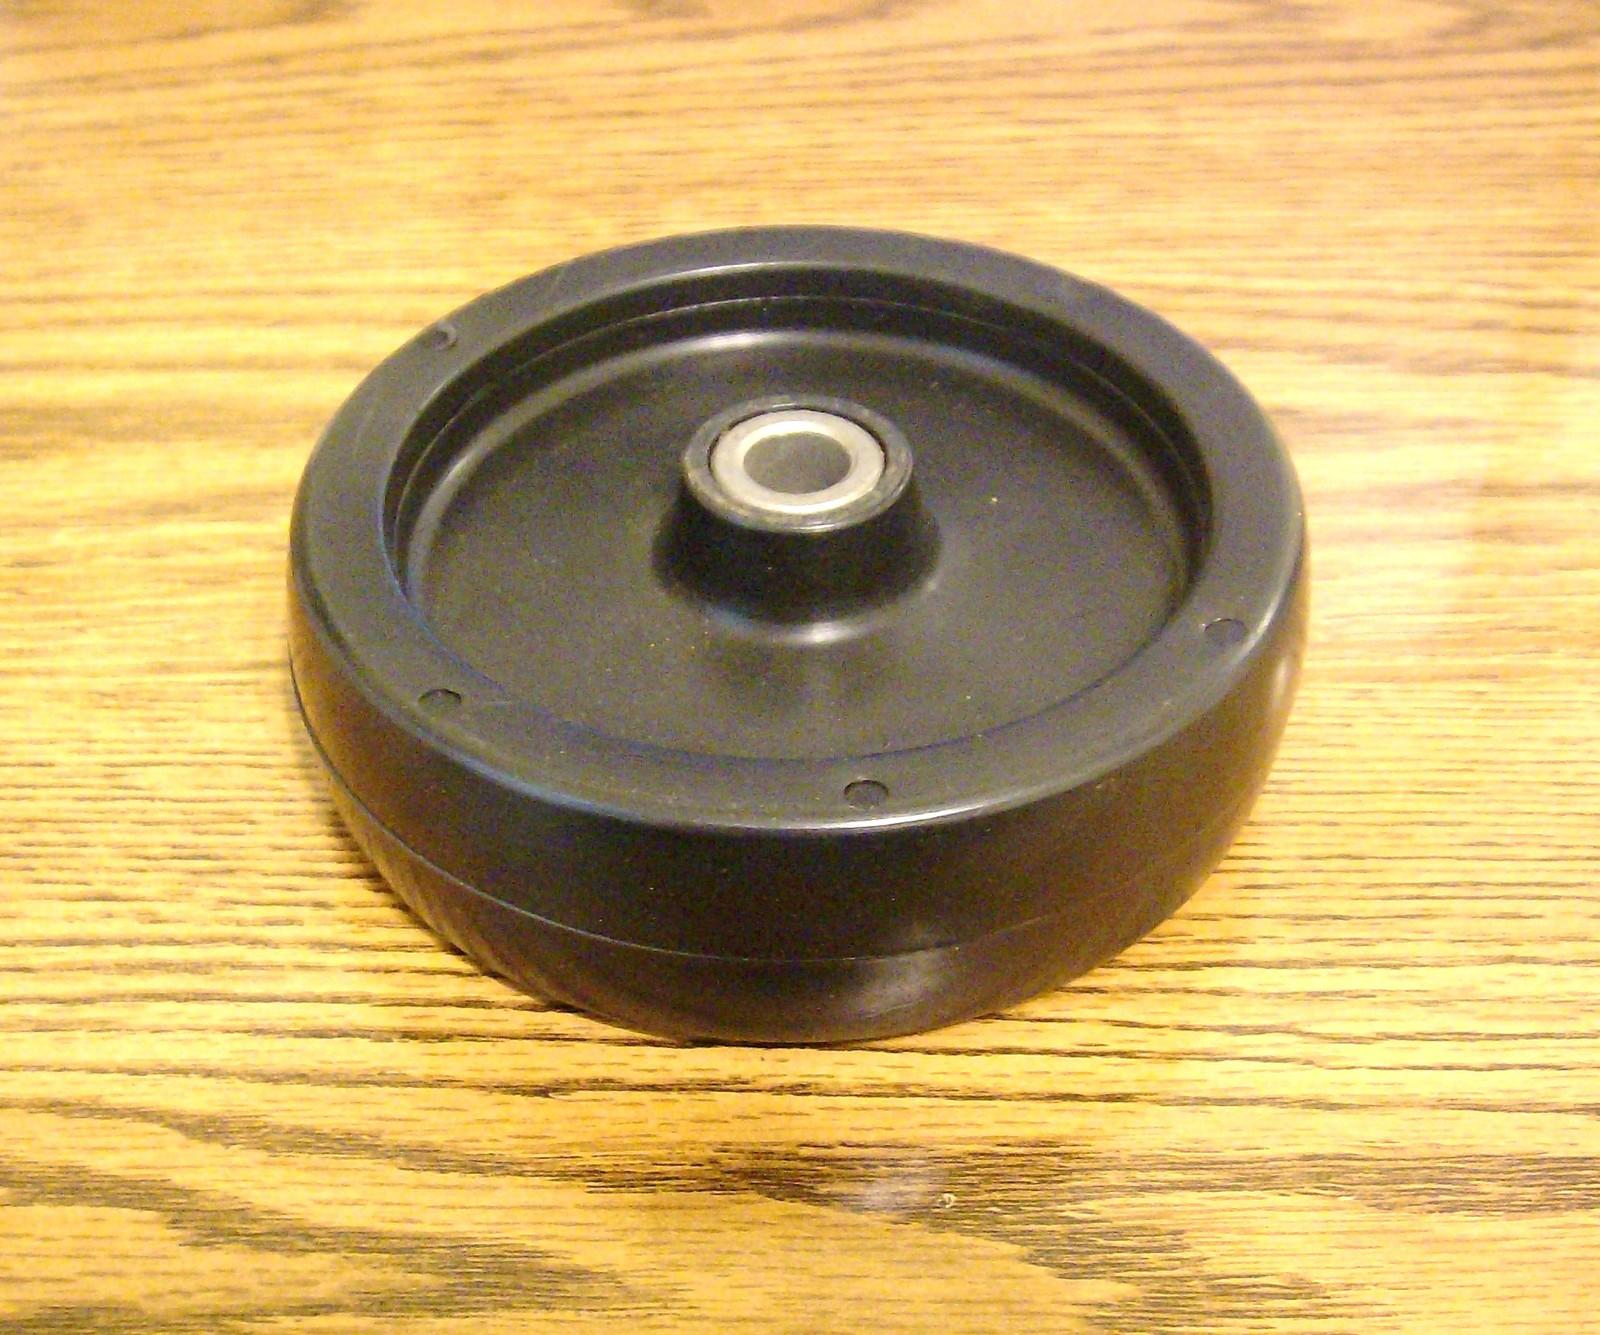 Poulan deck roller wheel tire 530-105455, 530105455